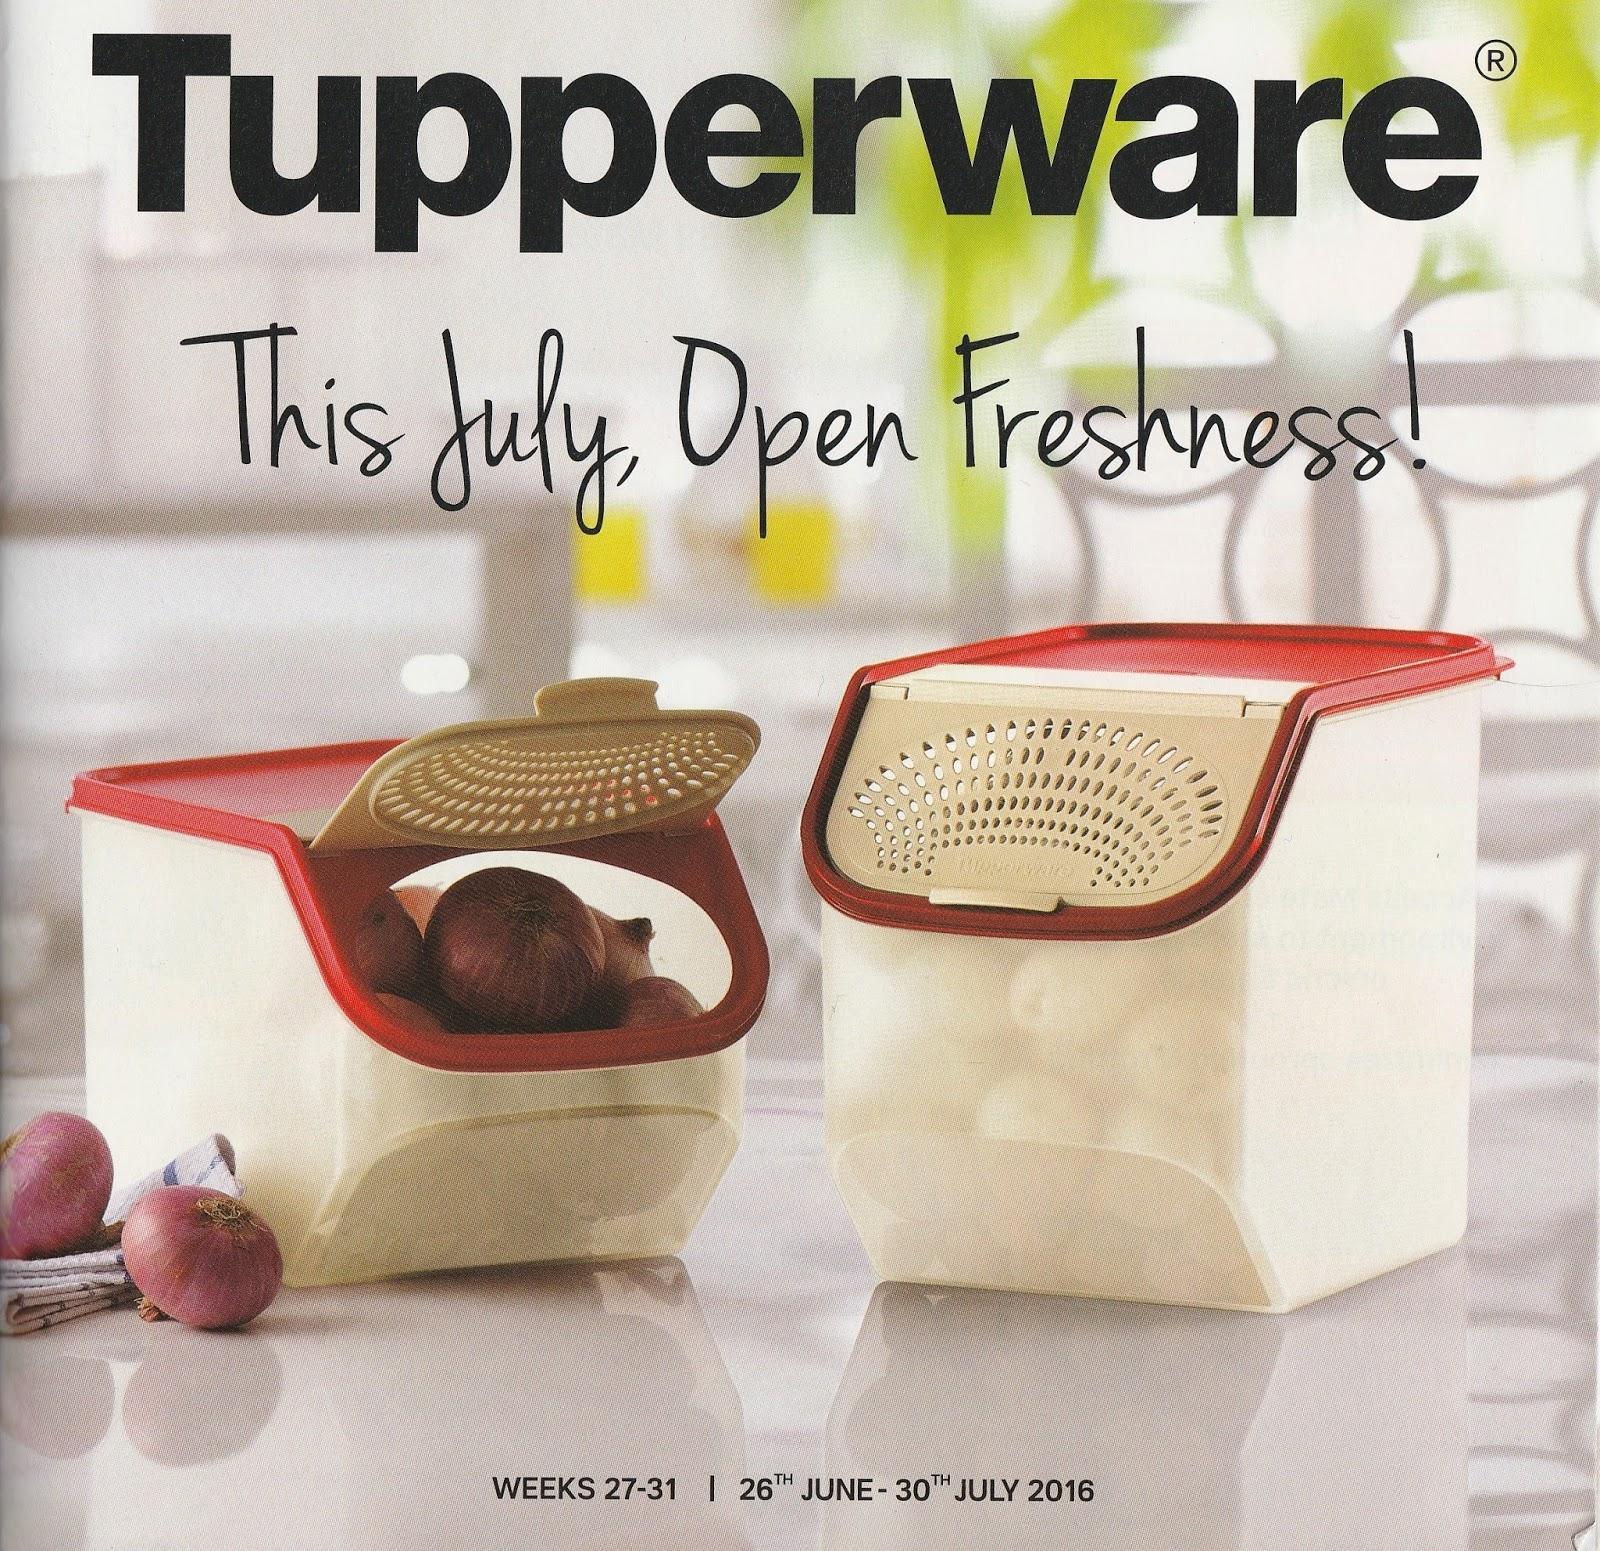 tupperware in pune tupperware india flyer july 2016. Black Bedroom Furniture Sets. Home Design Ideas